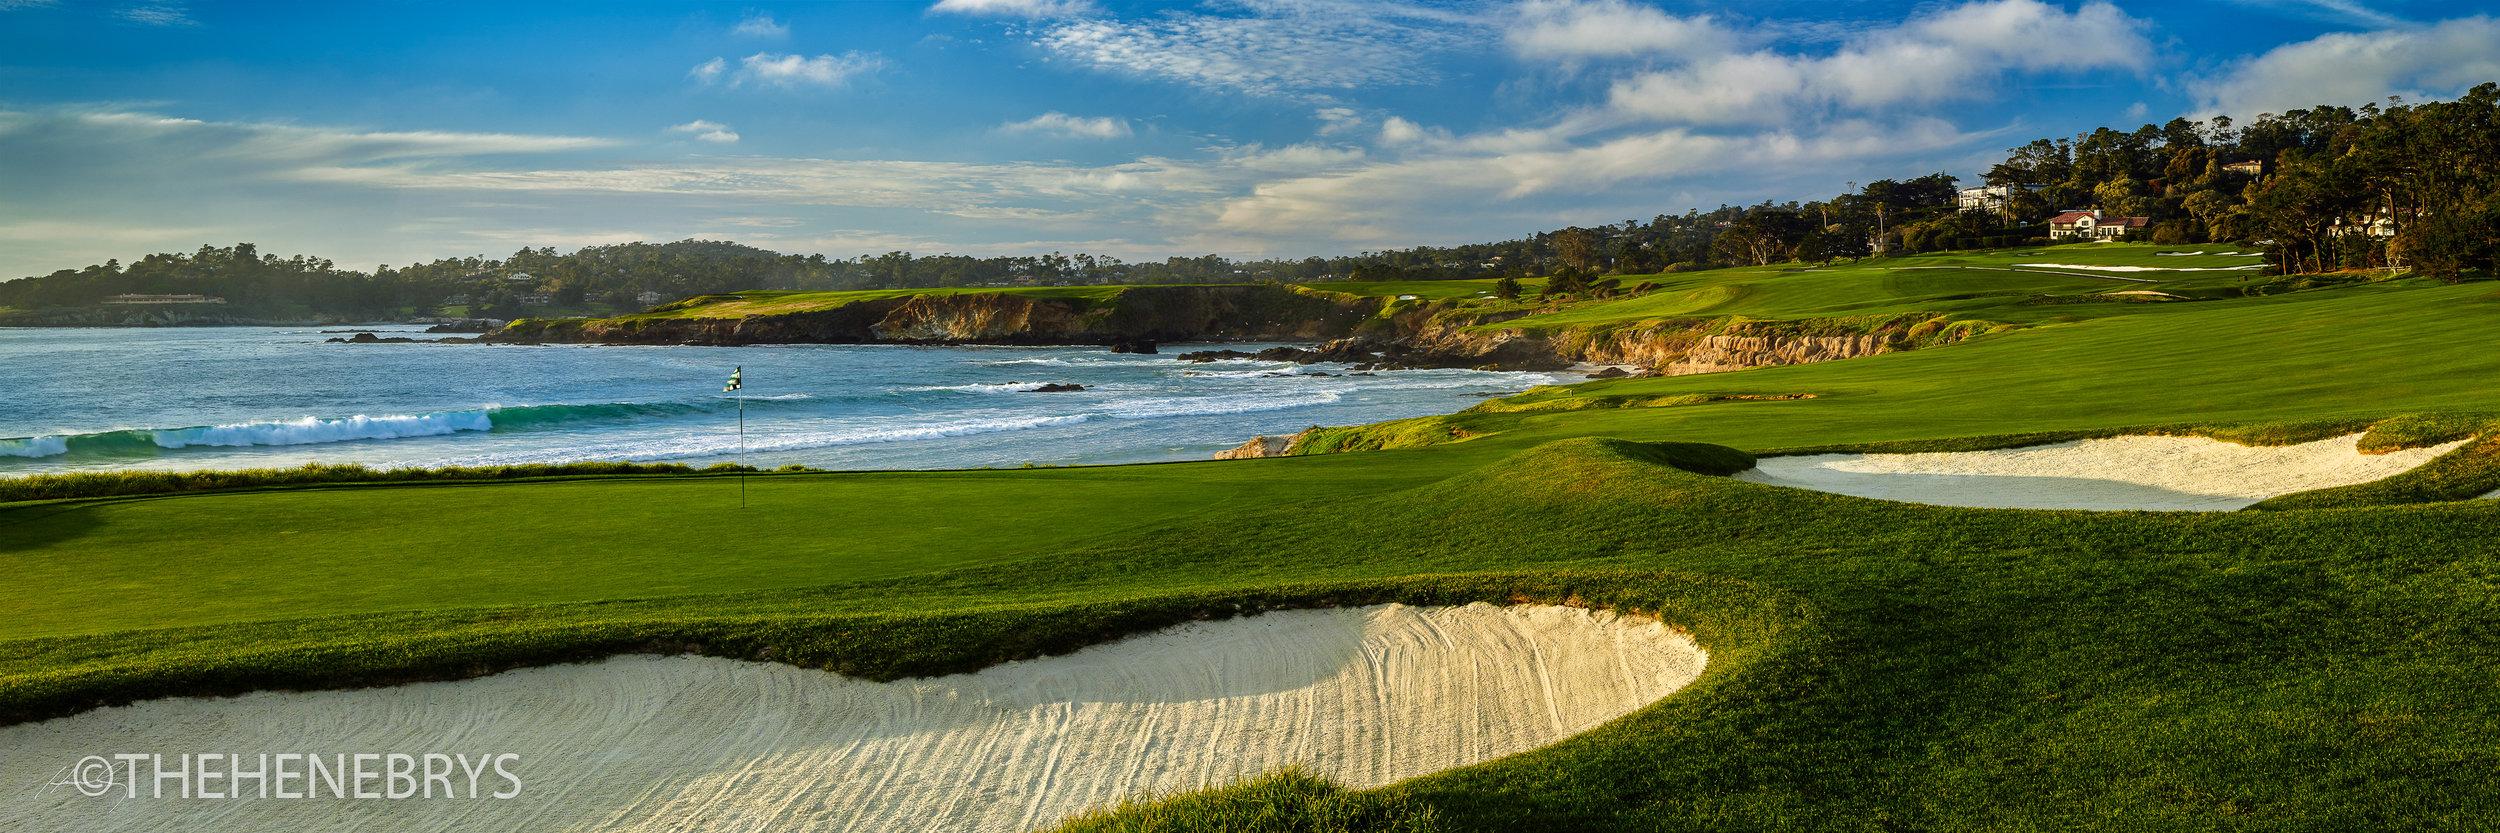 """Pebble Beach"" #10 Pebble Beach Golf Links®, California"